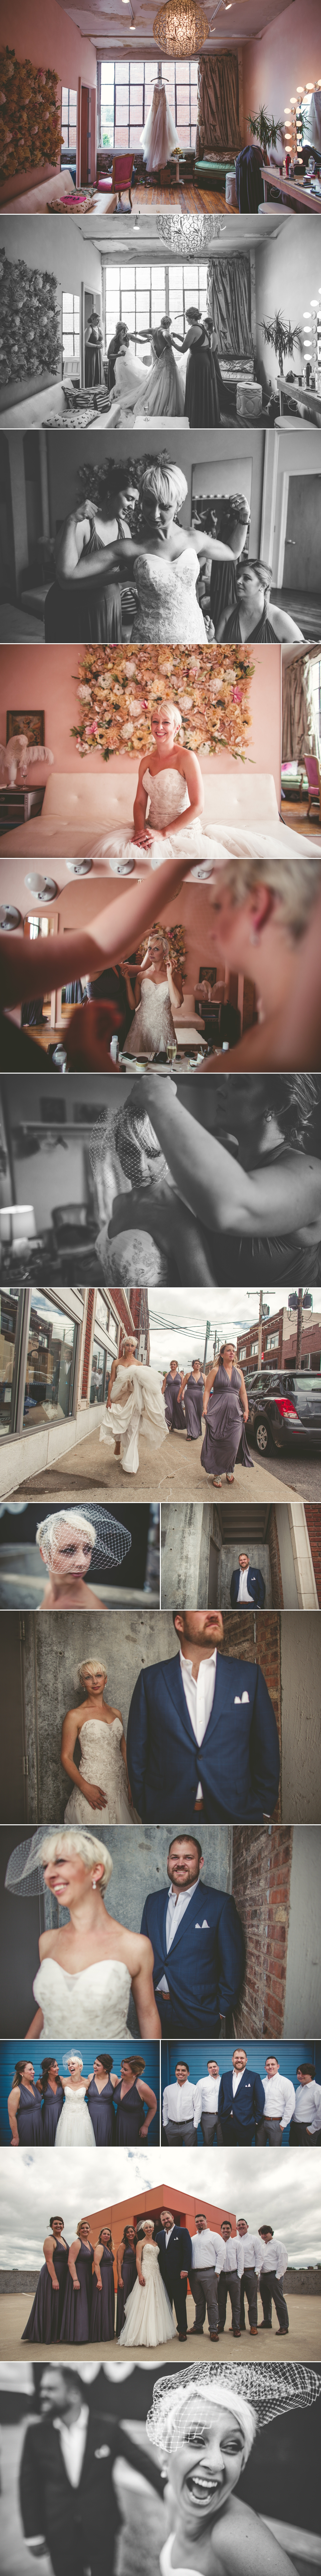 jason_domingues_photography_best_kansas_city_photographer_kc_weddings_toms_town_bauer_0001